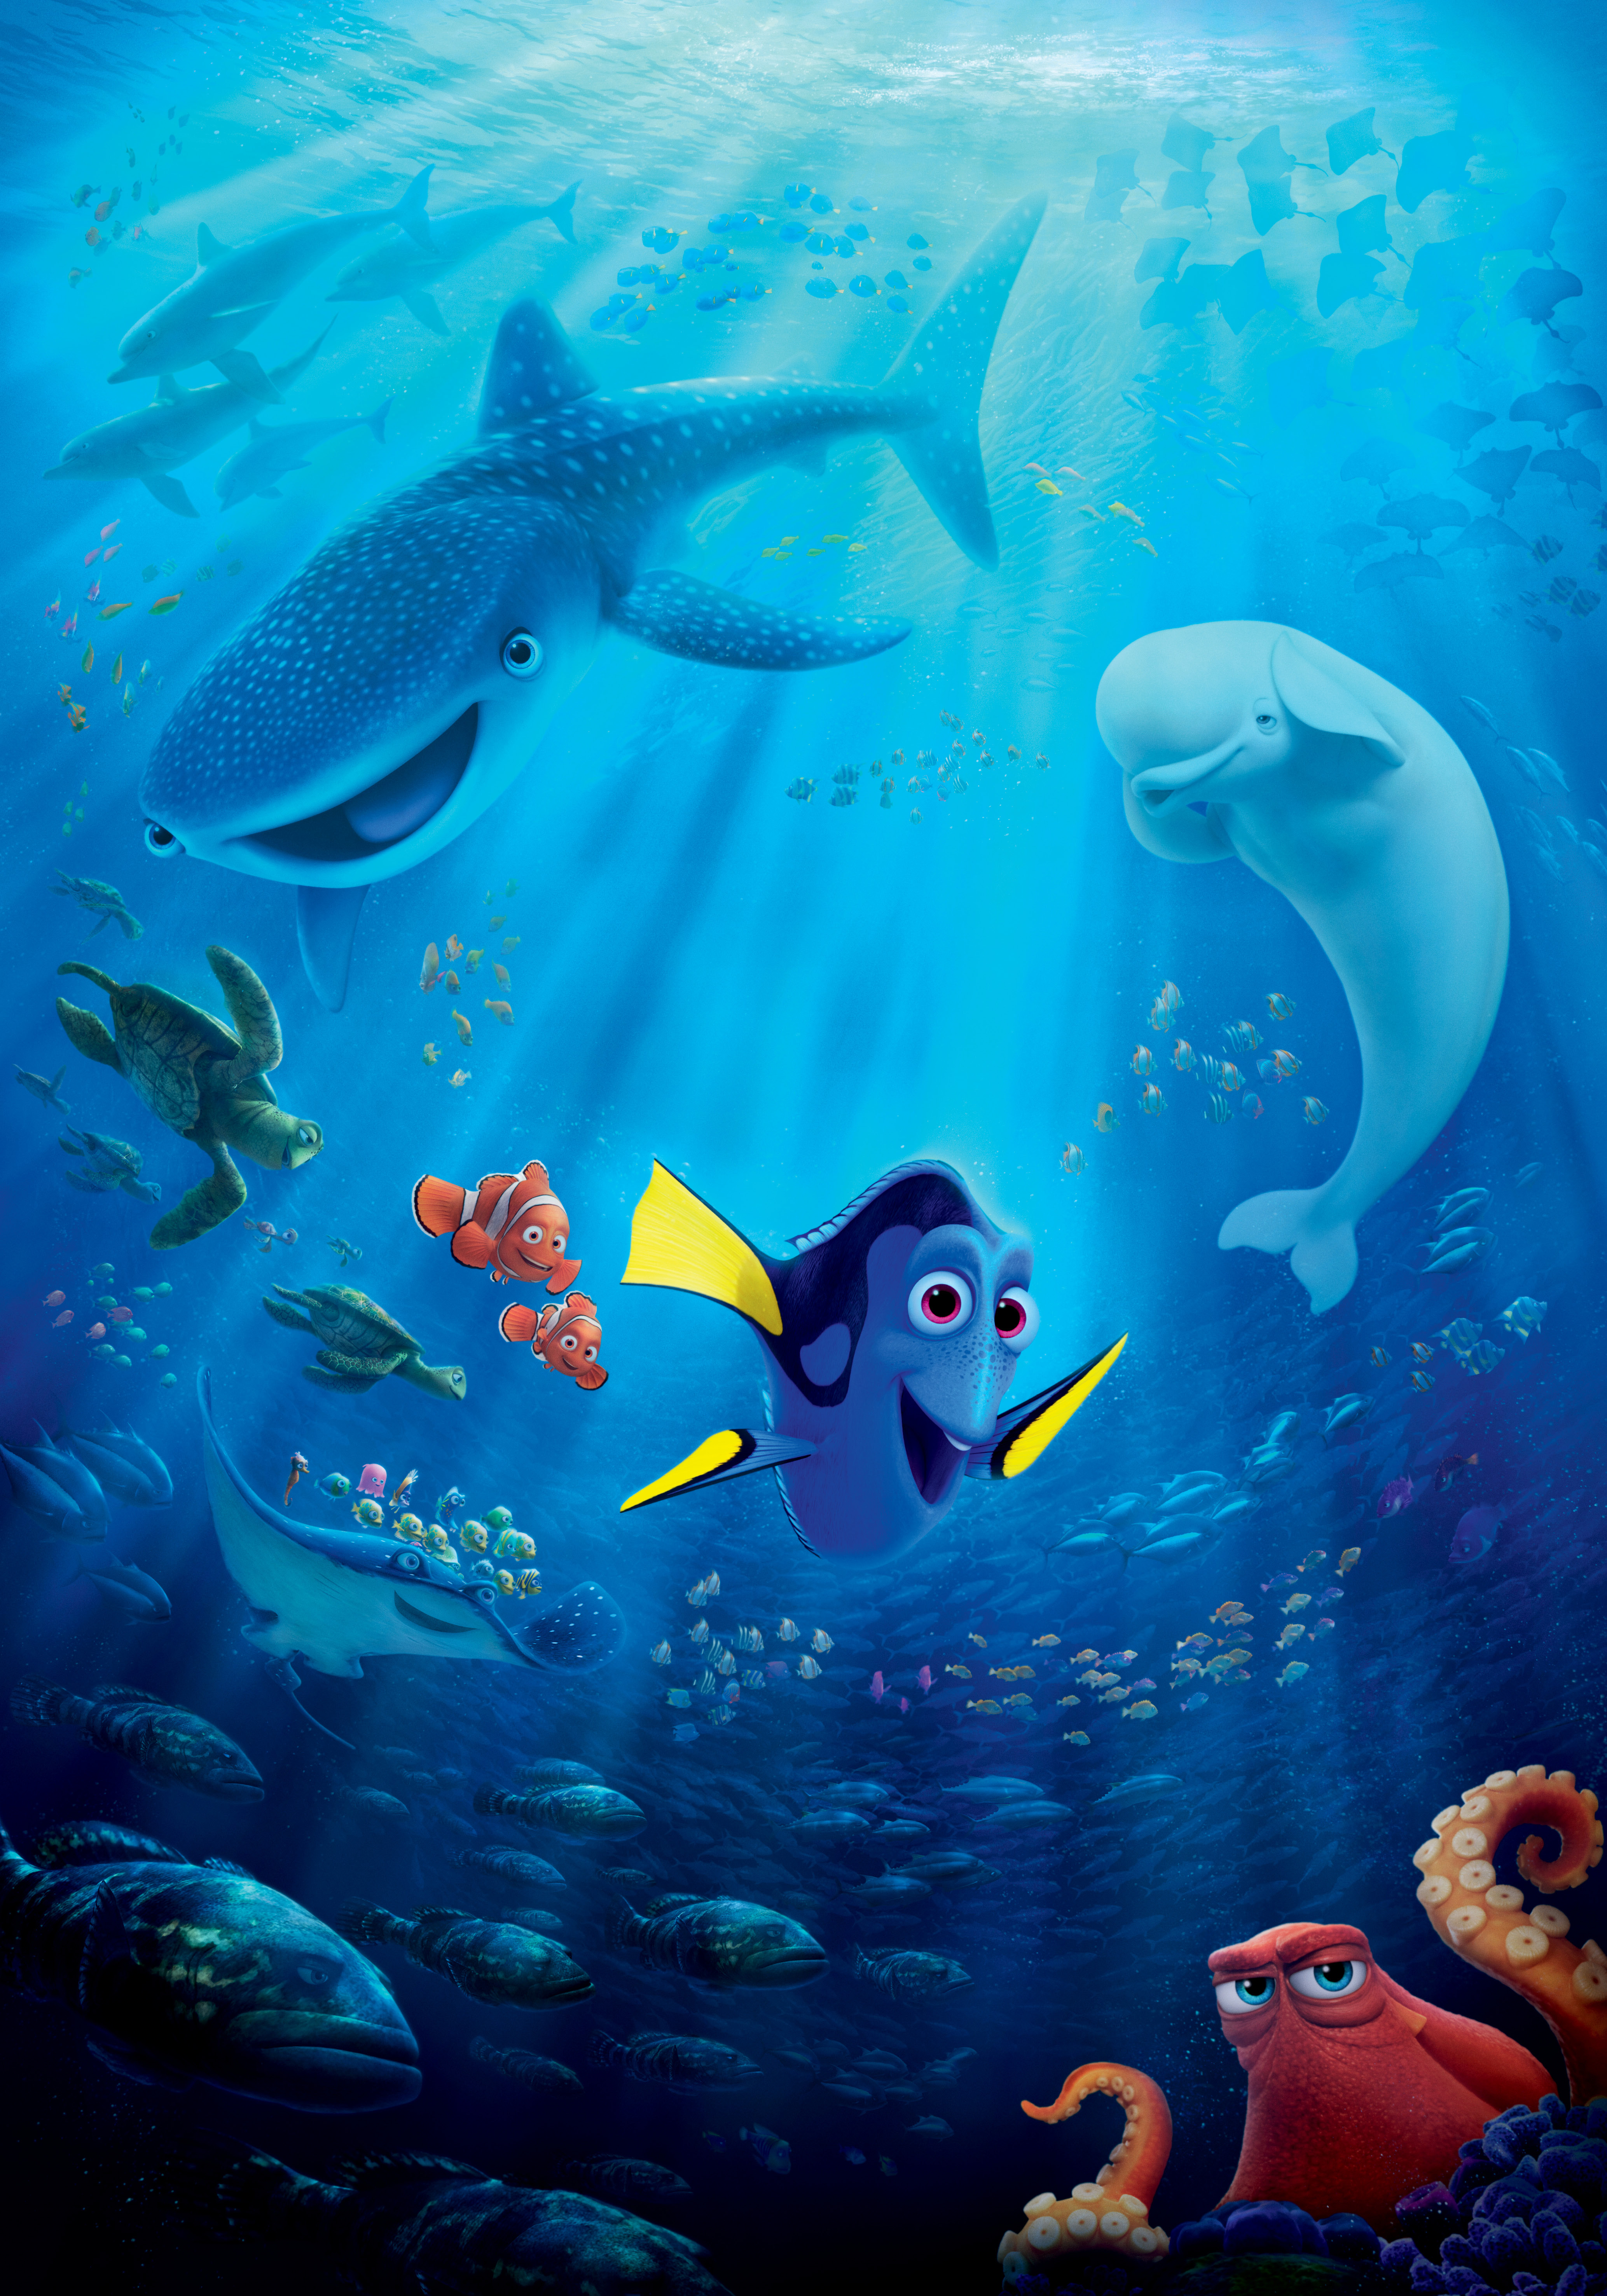 Summer Movie Night (Finding Dory)